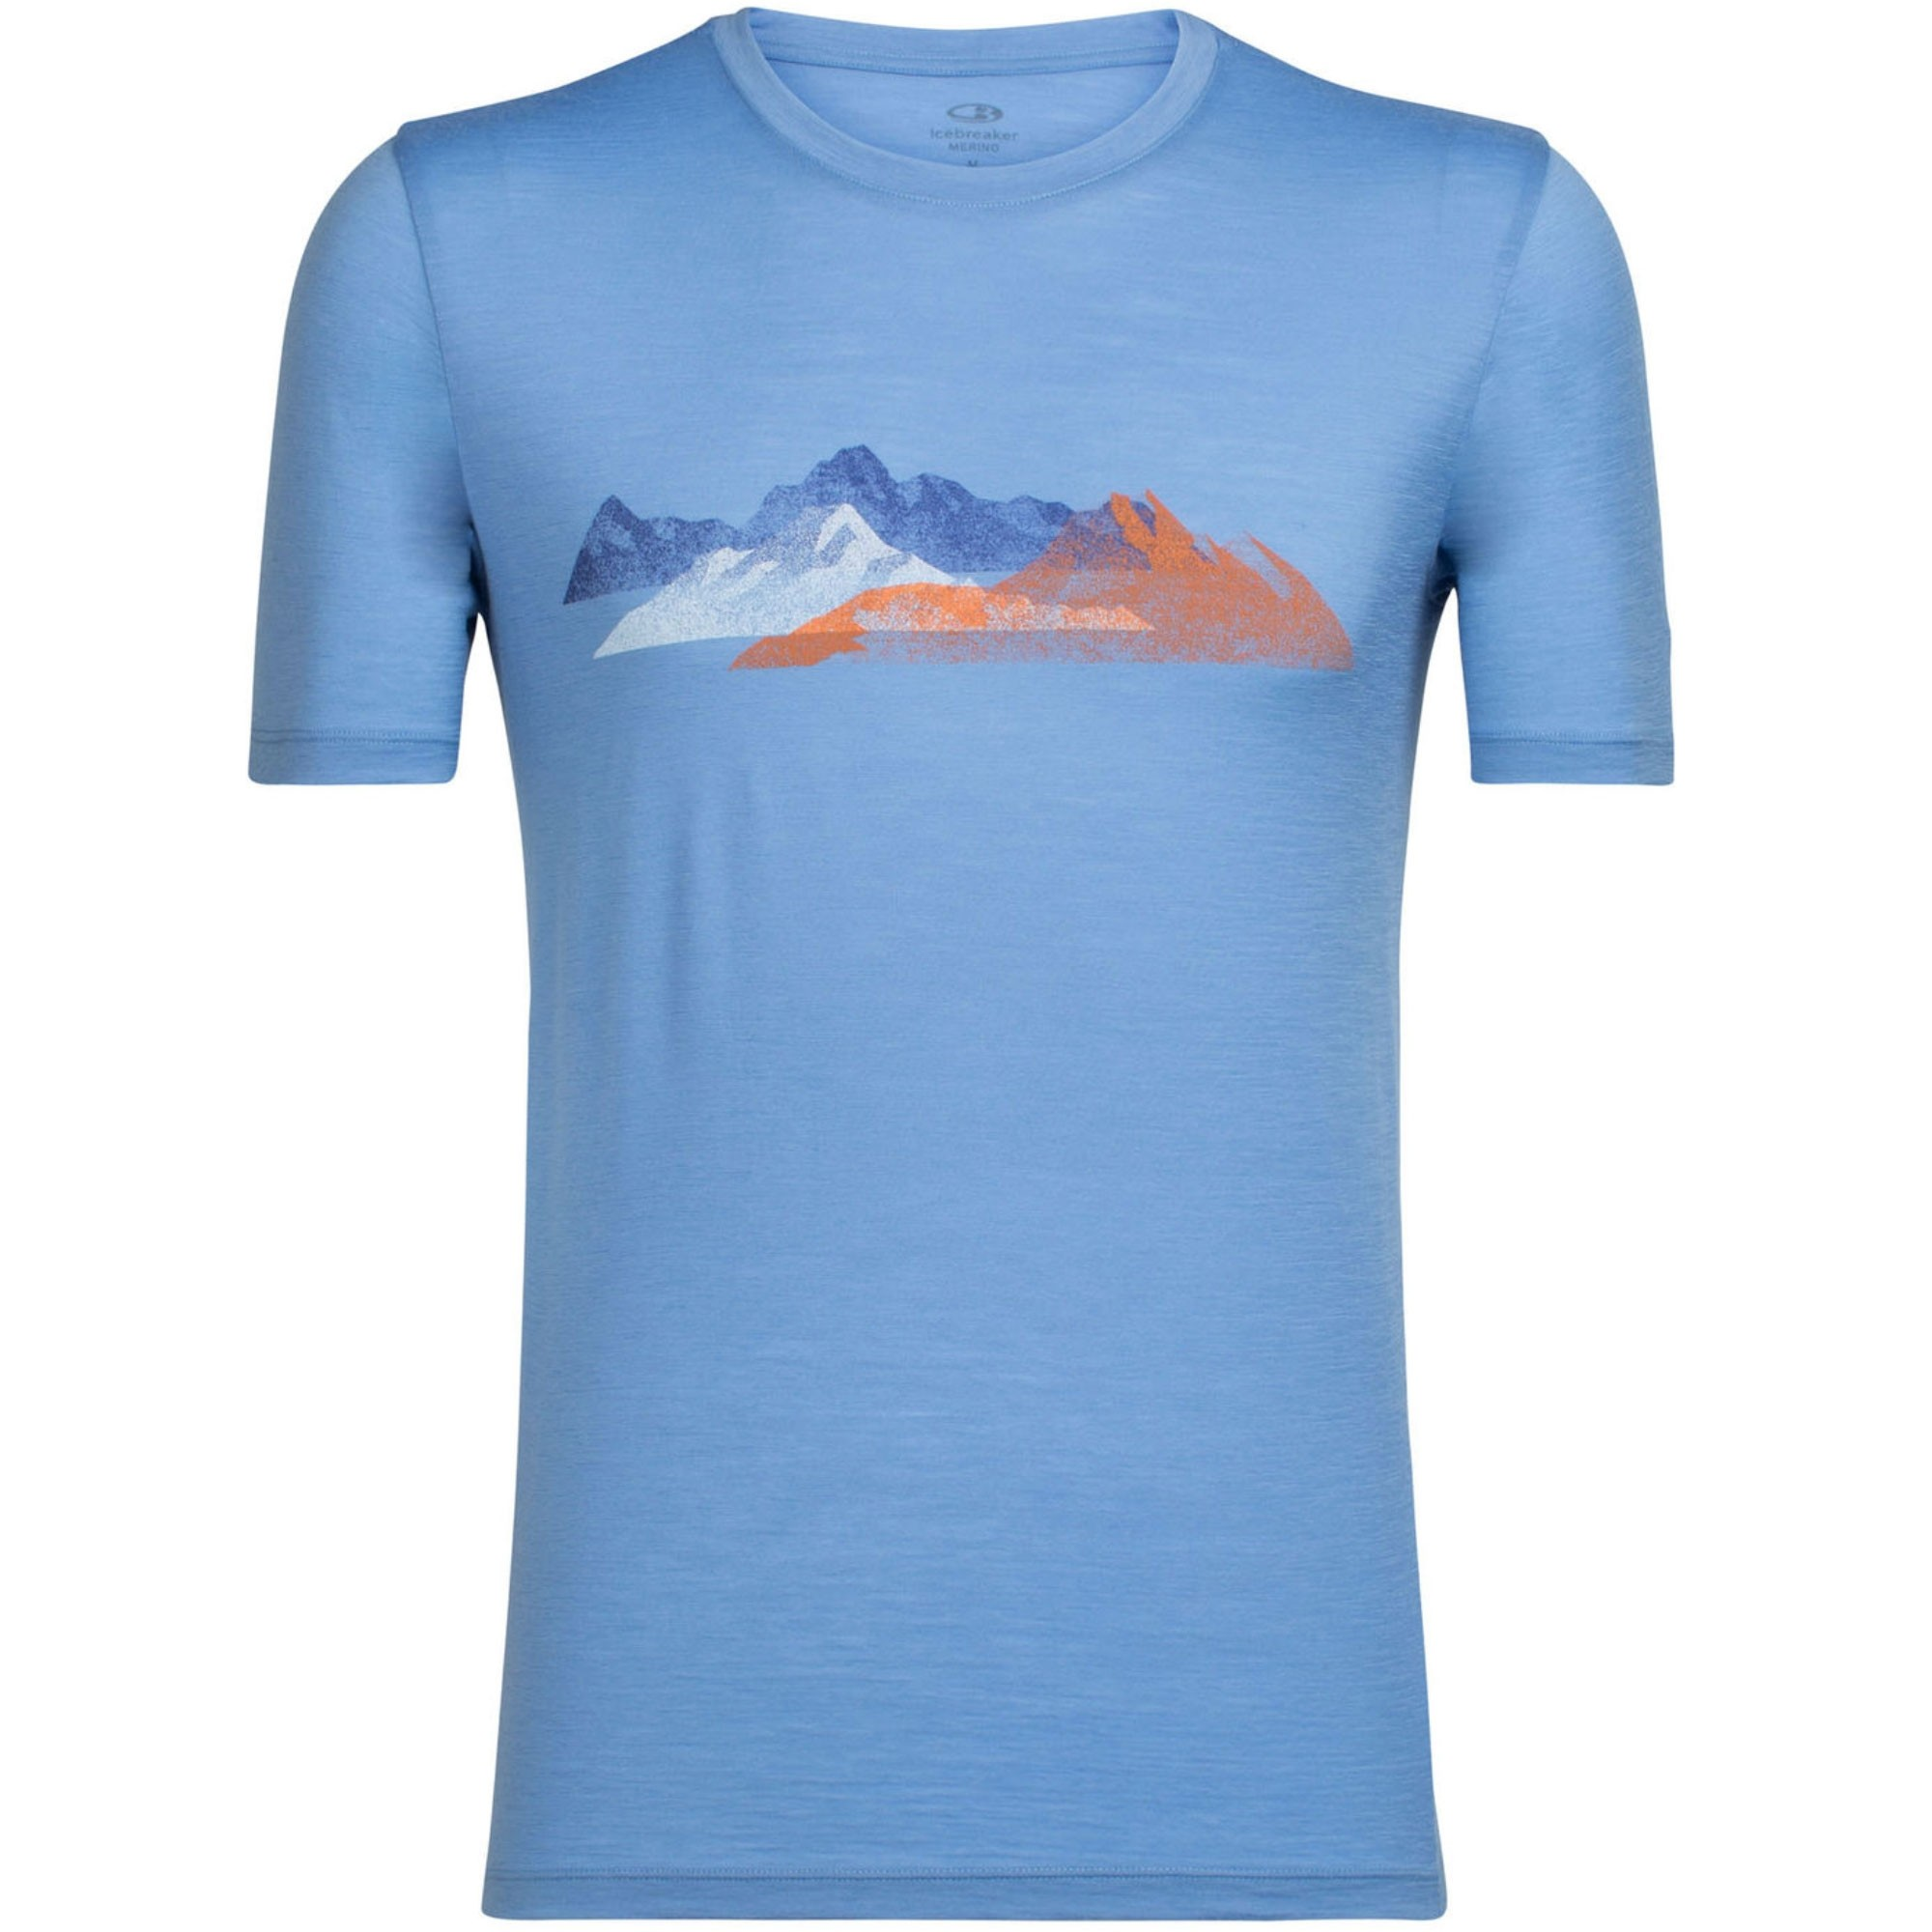 Icebreaker Tech Lite SS Crewe T-Shirt - Misty Peak - Chalk Blue